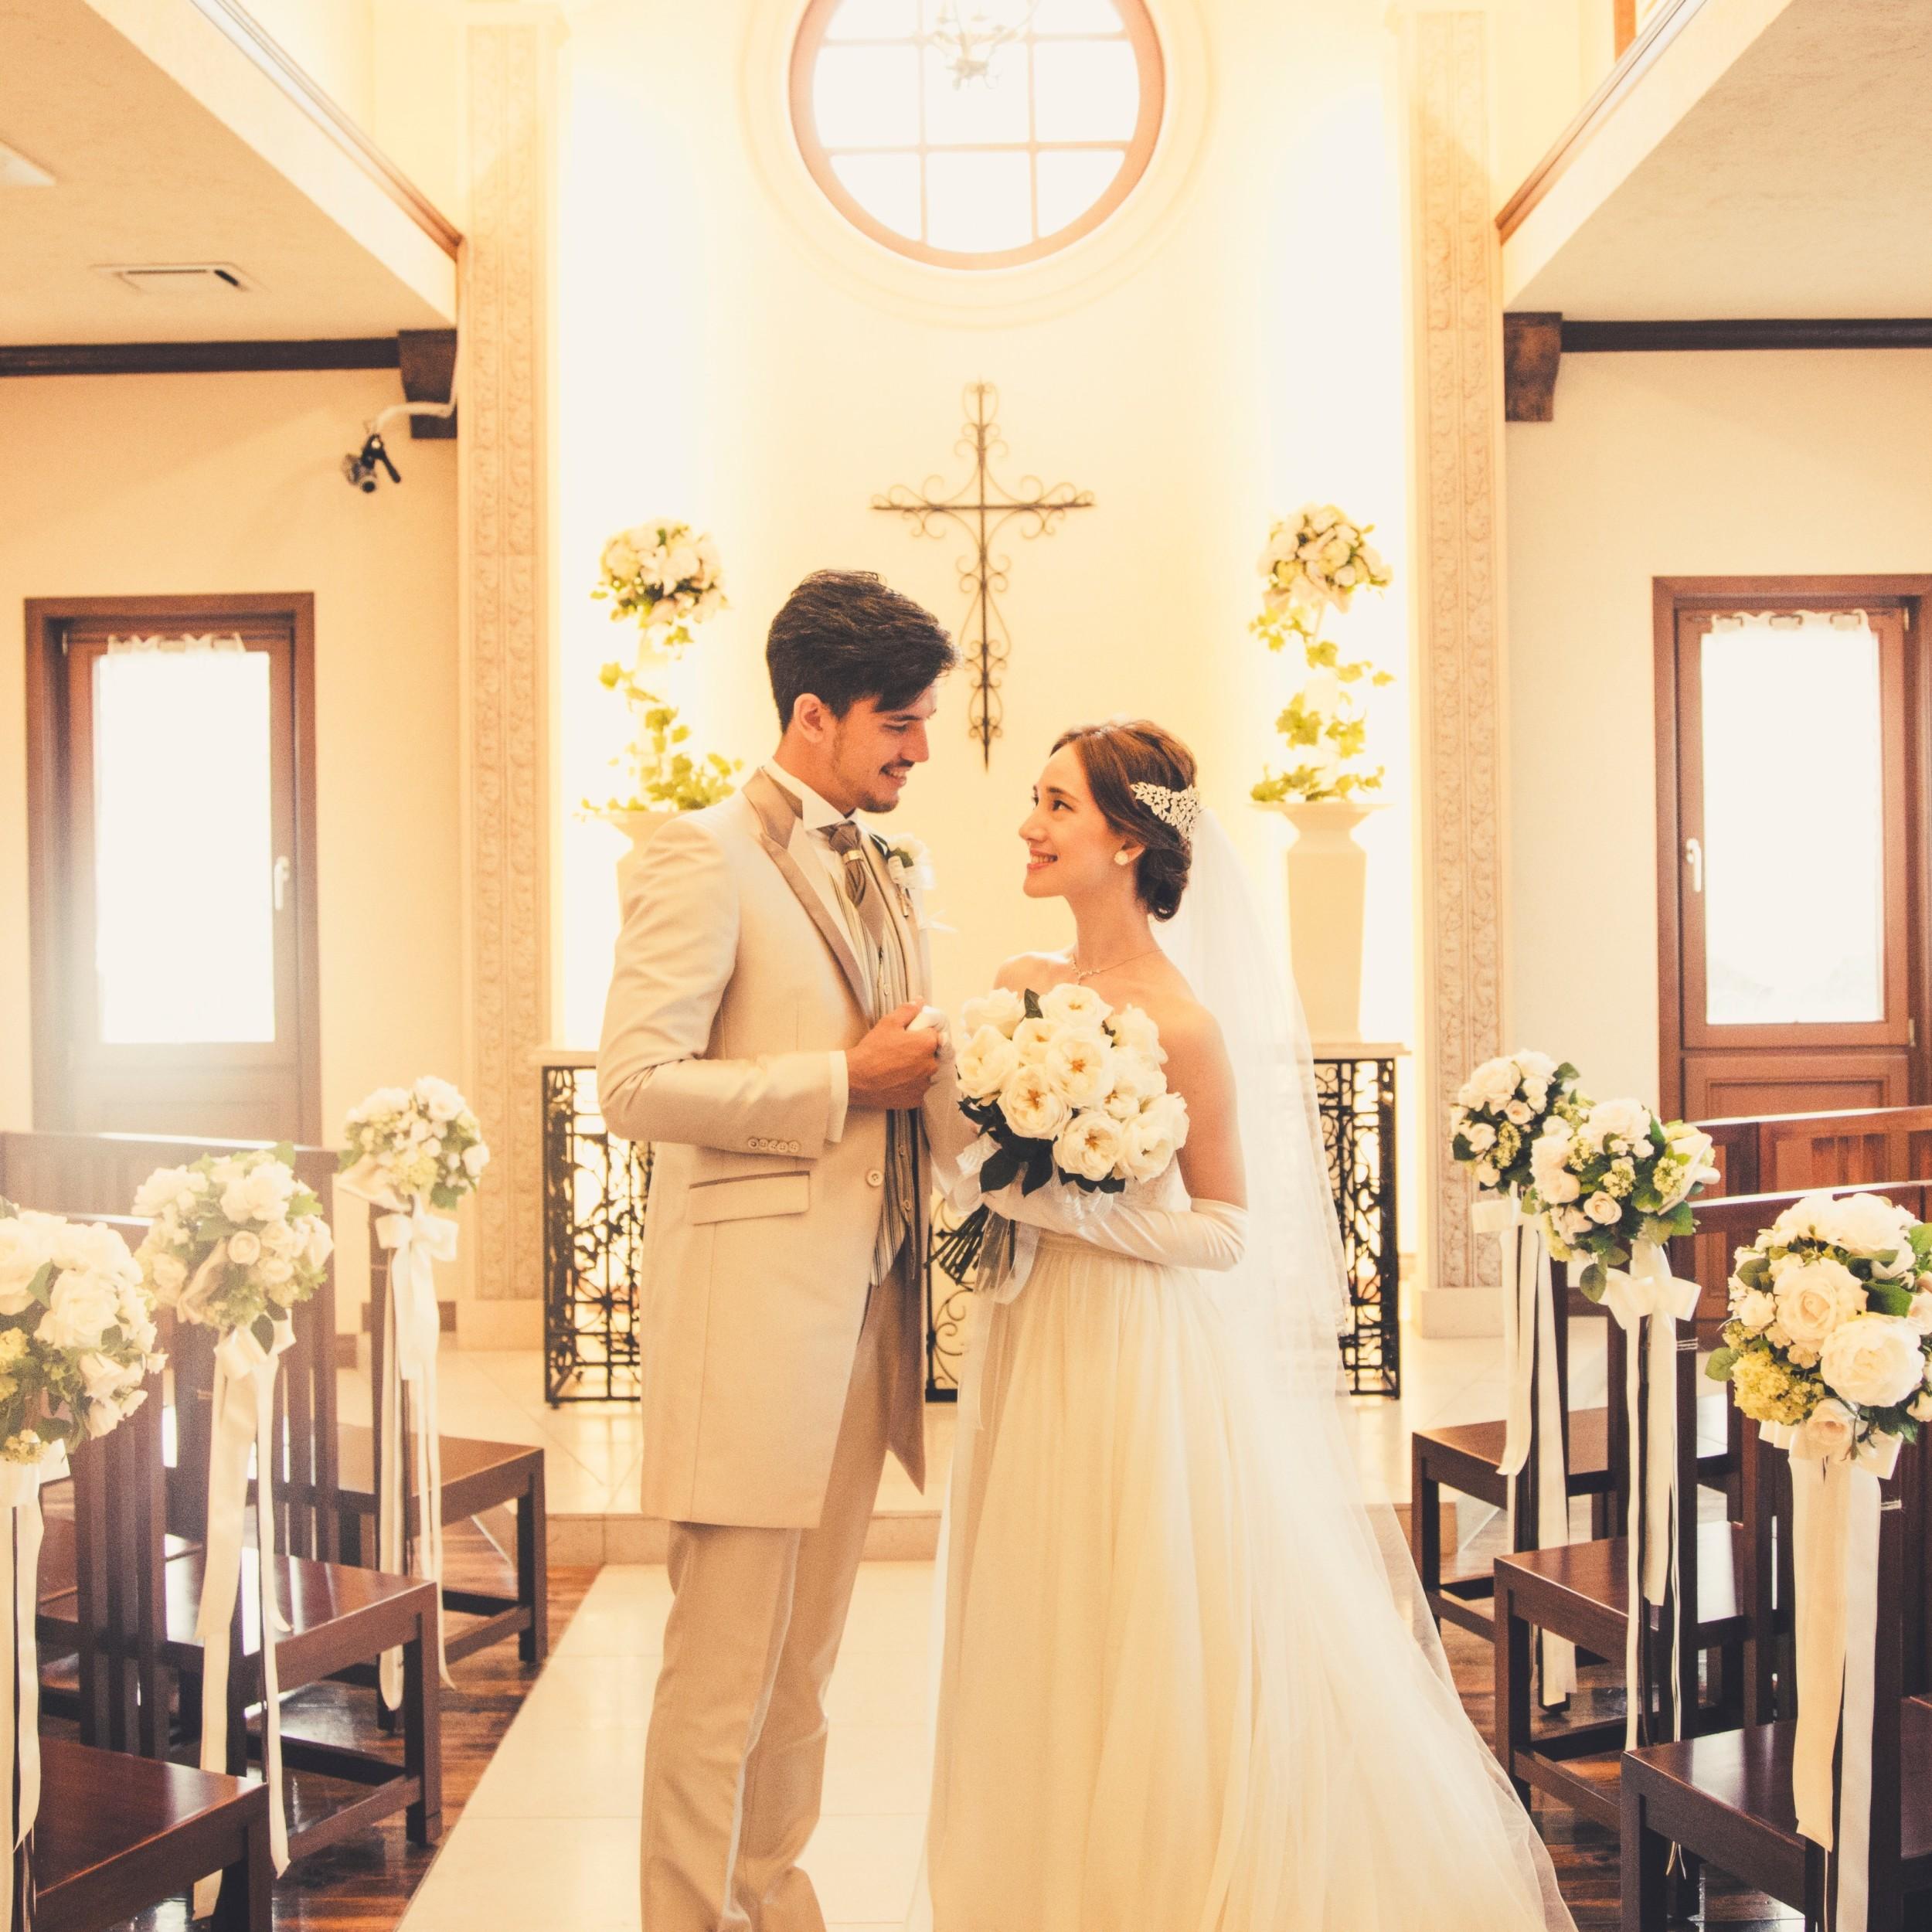 ec5be2ba9e997 水戸市で再婚をお考えならレストランウエディングで結婚式を挙げませんか?